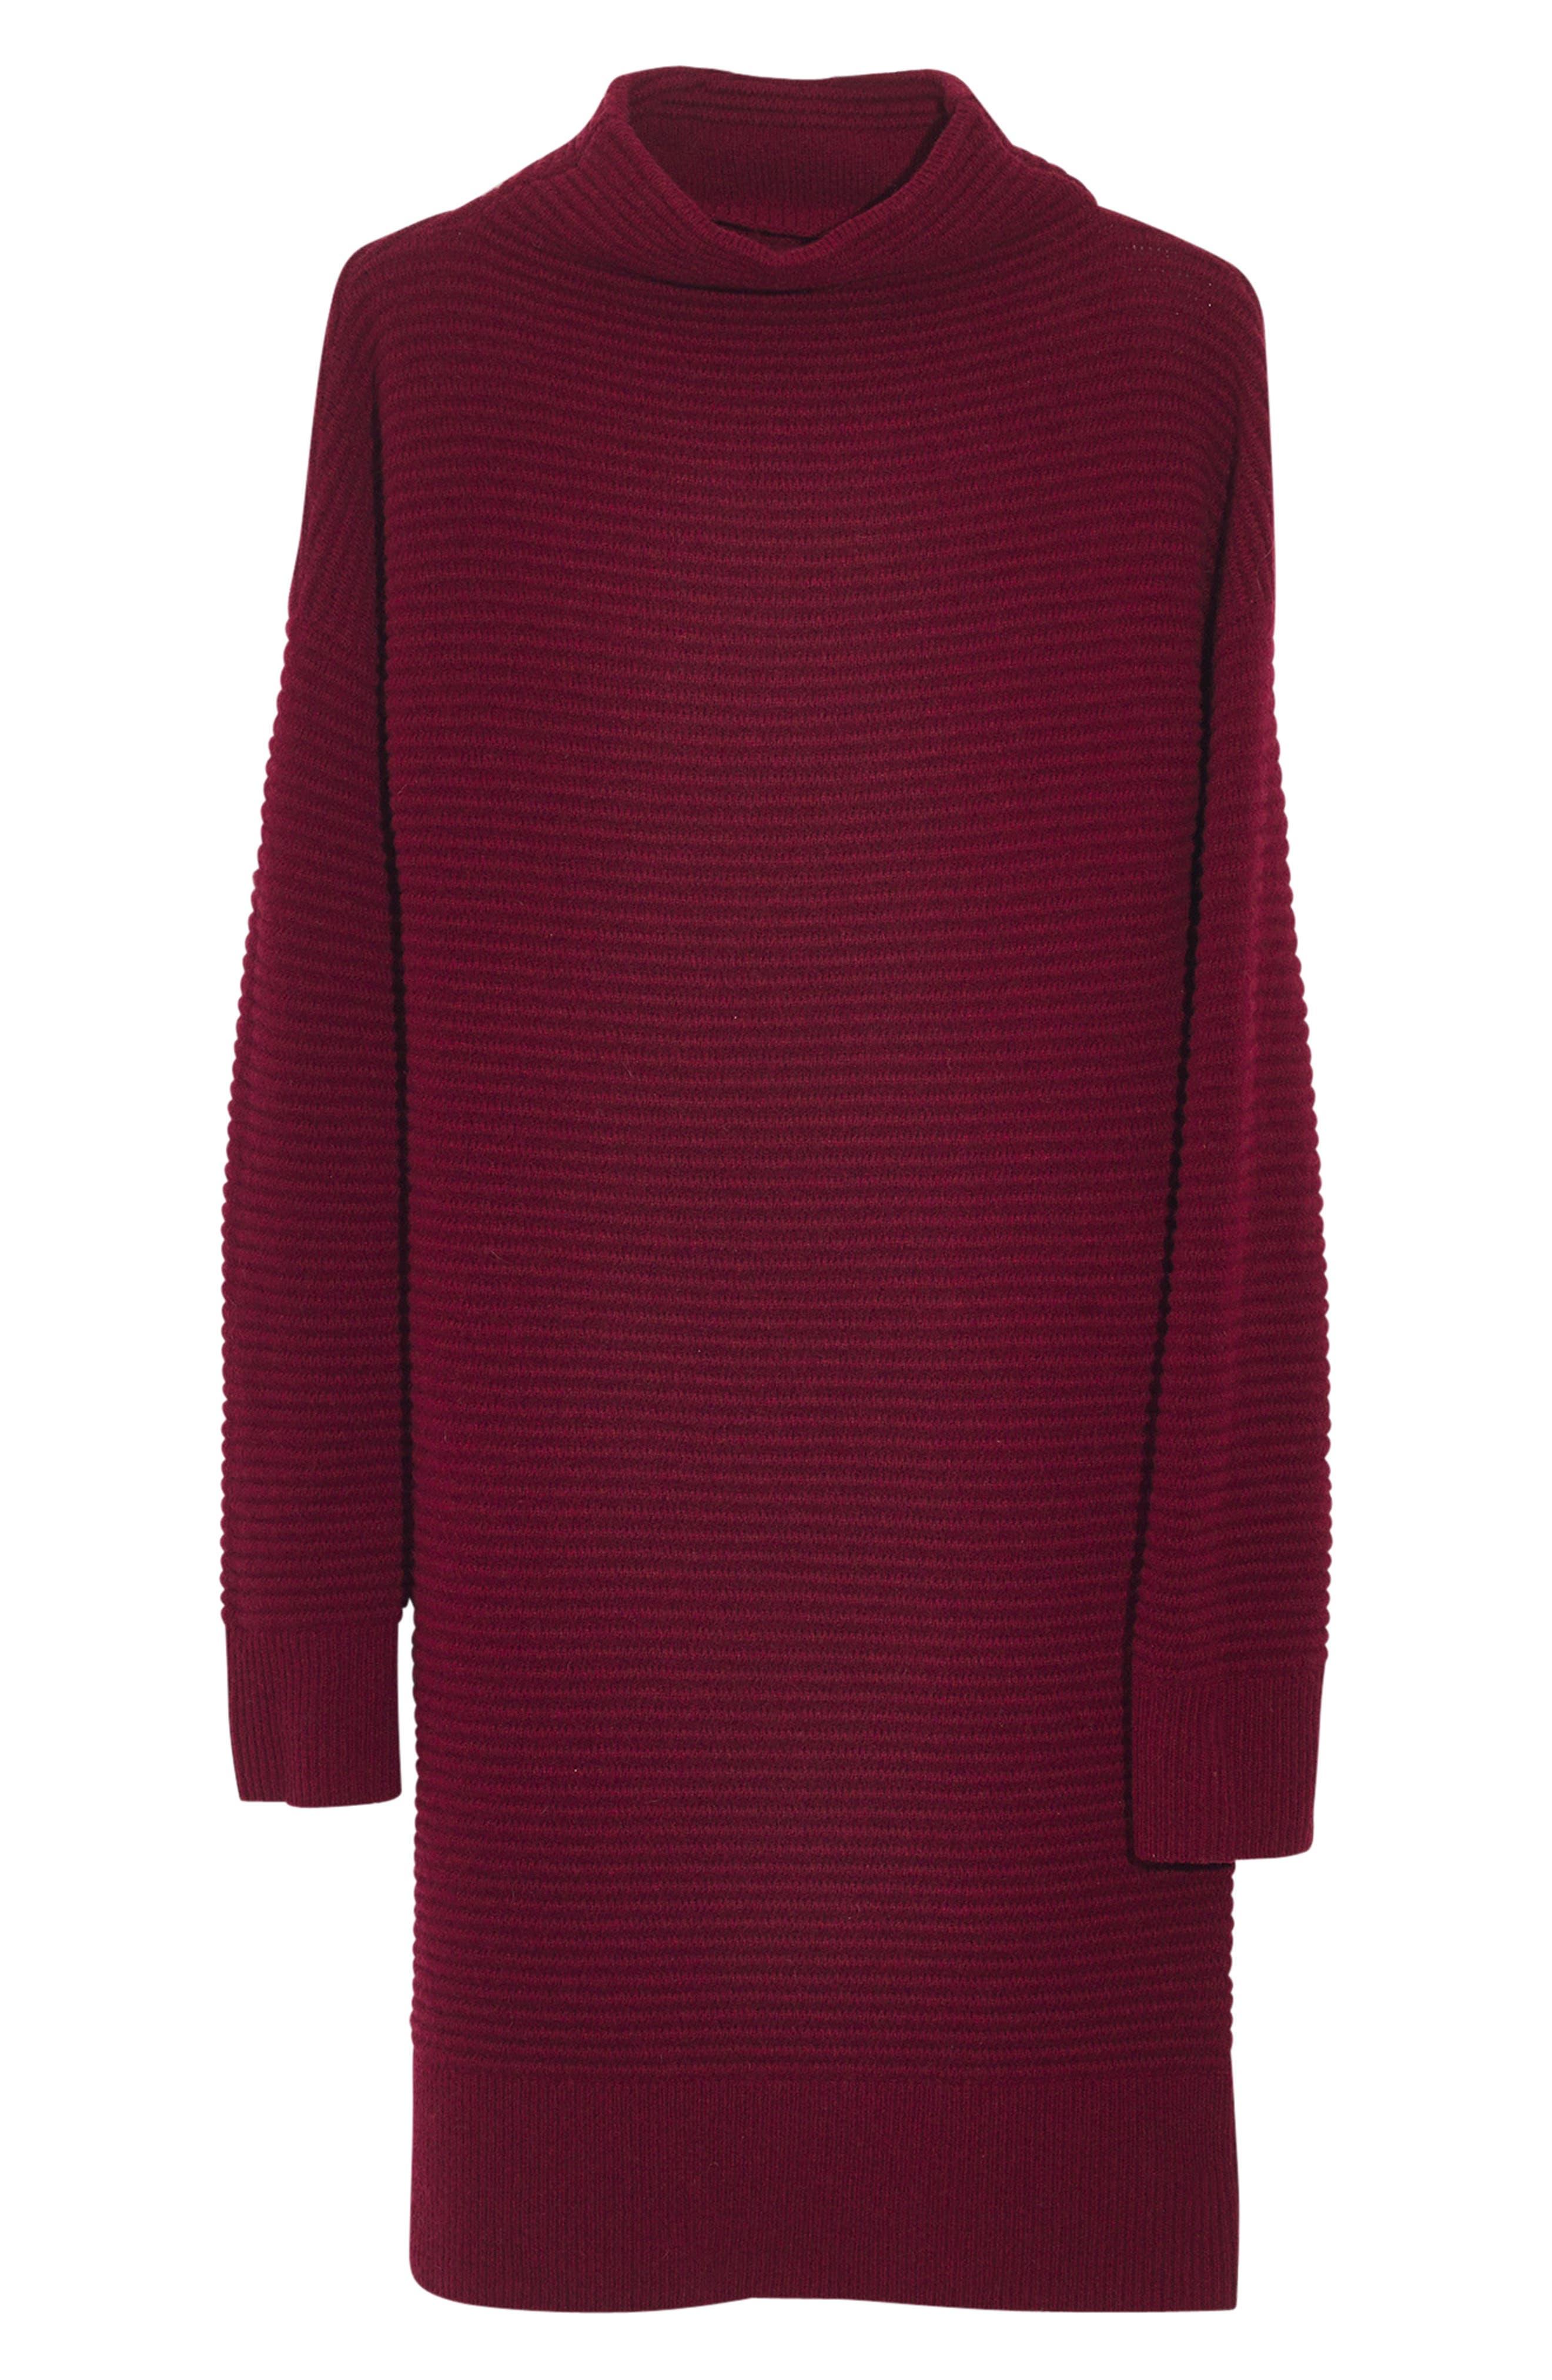 Skyscraper Merino Wool Sweater Dress,                             Alternate thumbnail 4, color,                             HEATHER BURGUNDY